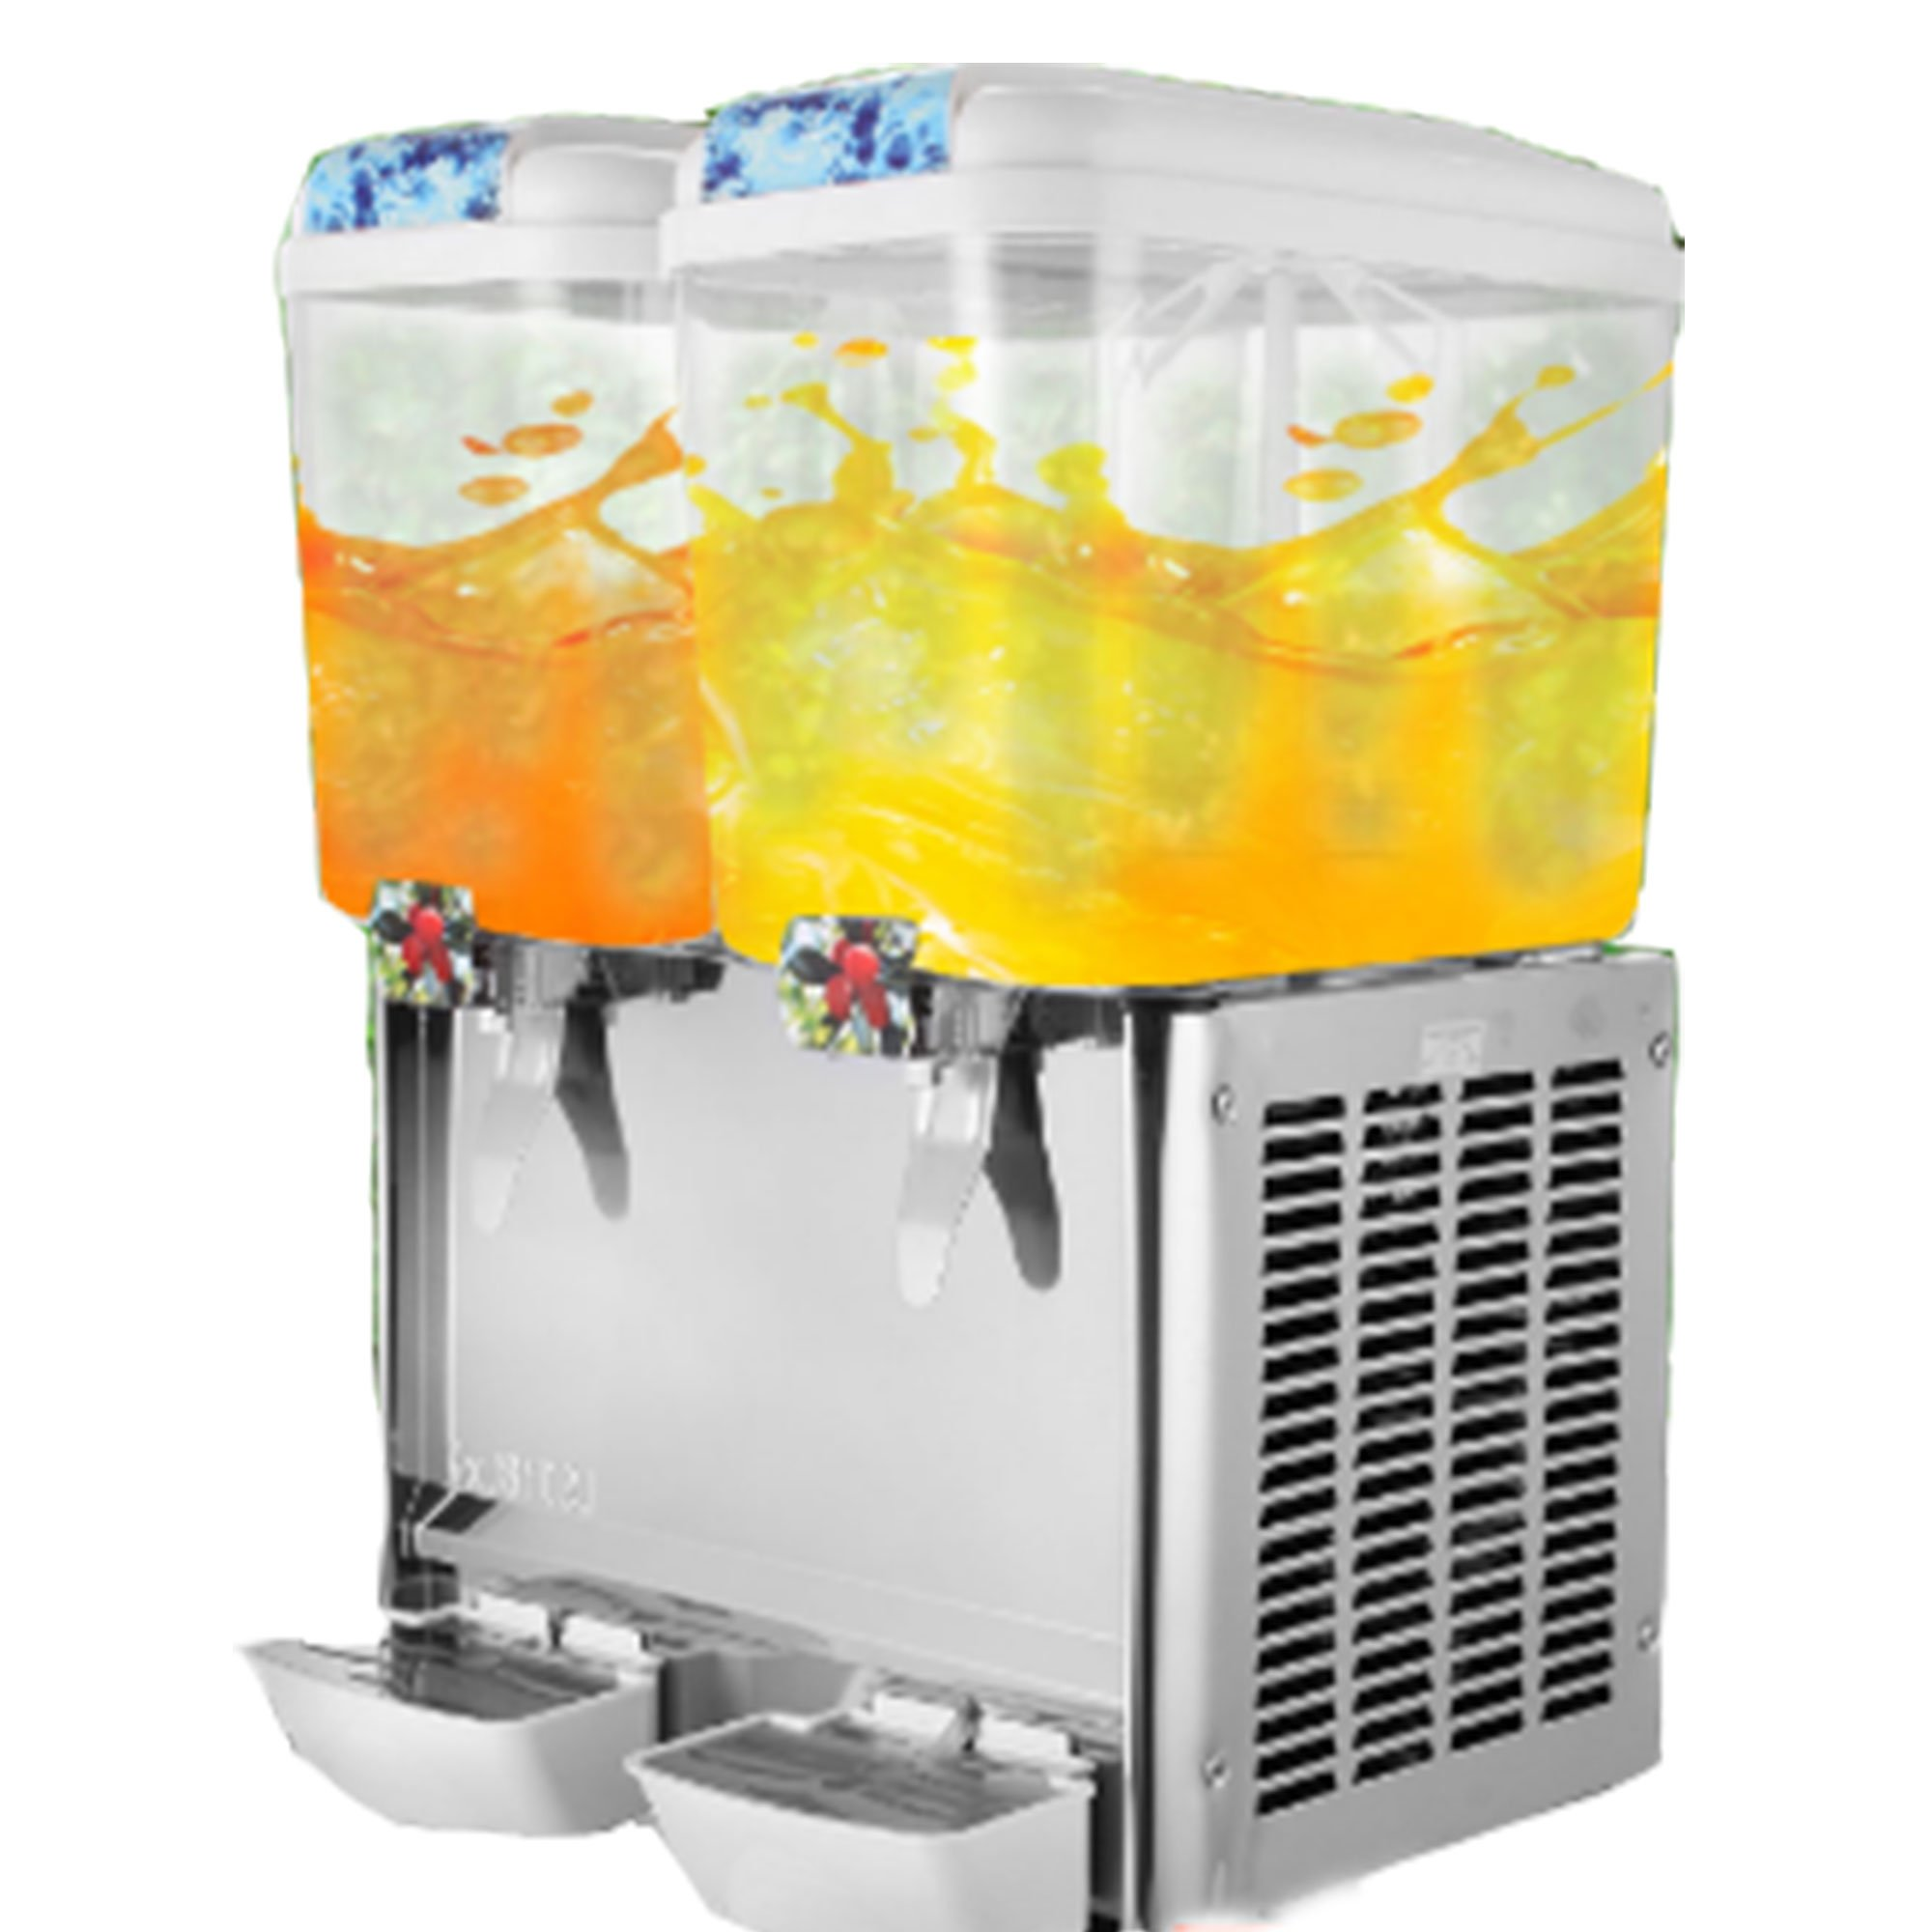 Happybuy 2 Tanks Juice Dispenser 4.75 Gallon/ Tank Cold Beverage Dispenser Plastic/Stainless Steel Finish Beverage Dispenser Commercial Use (9.5 Gallon)